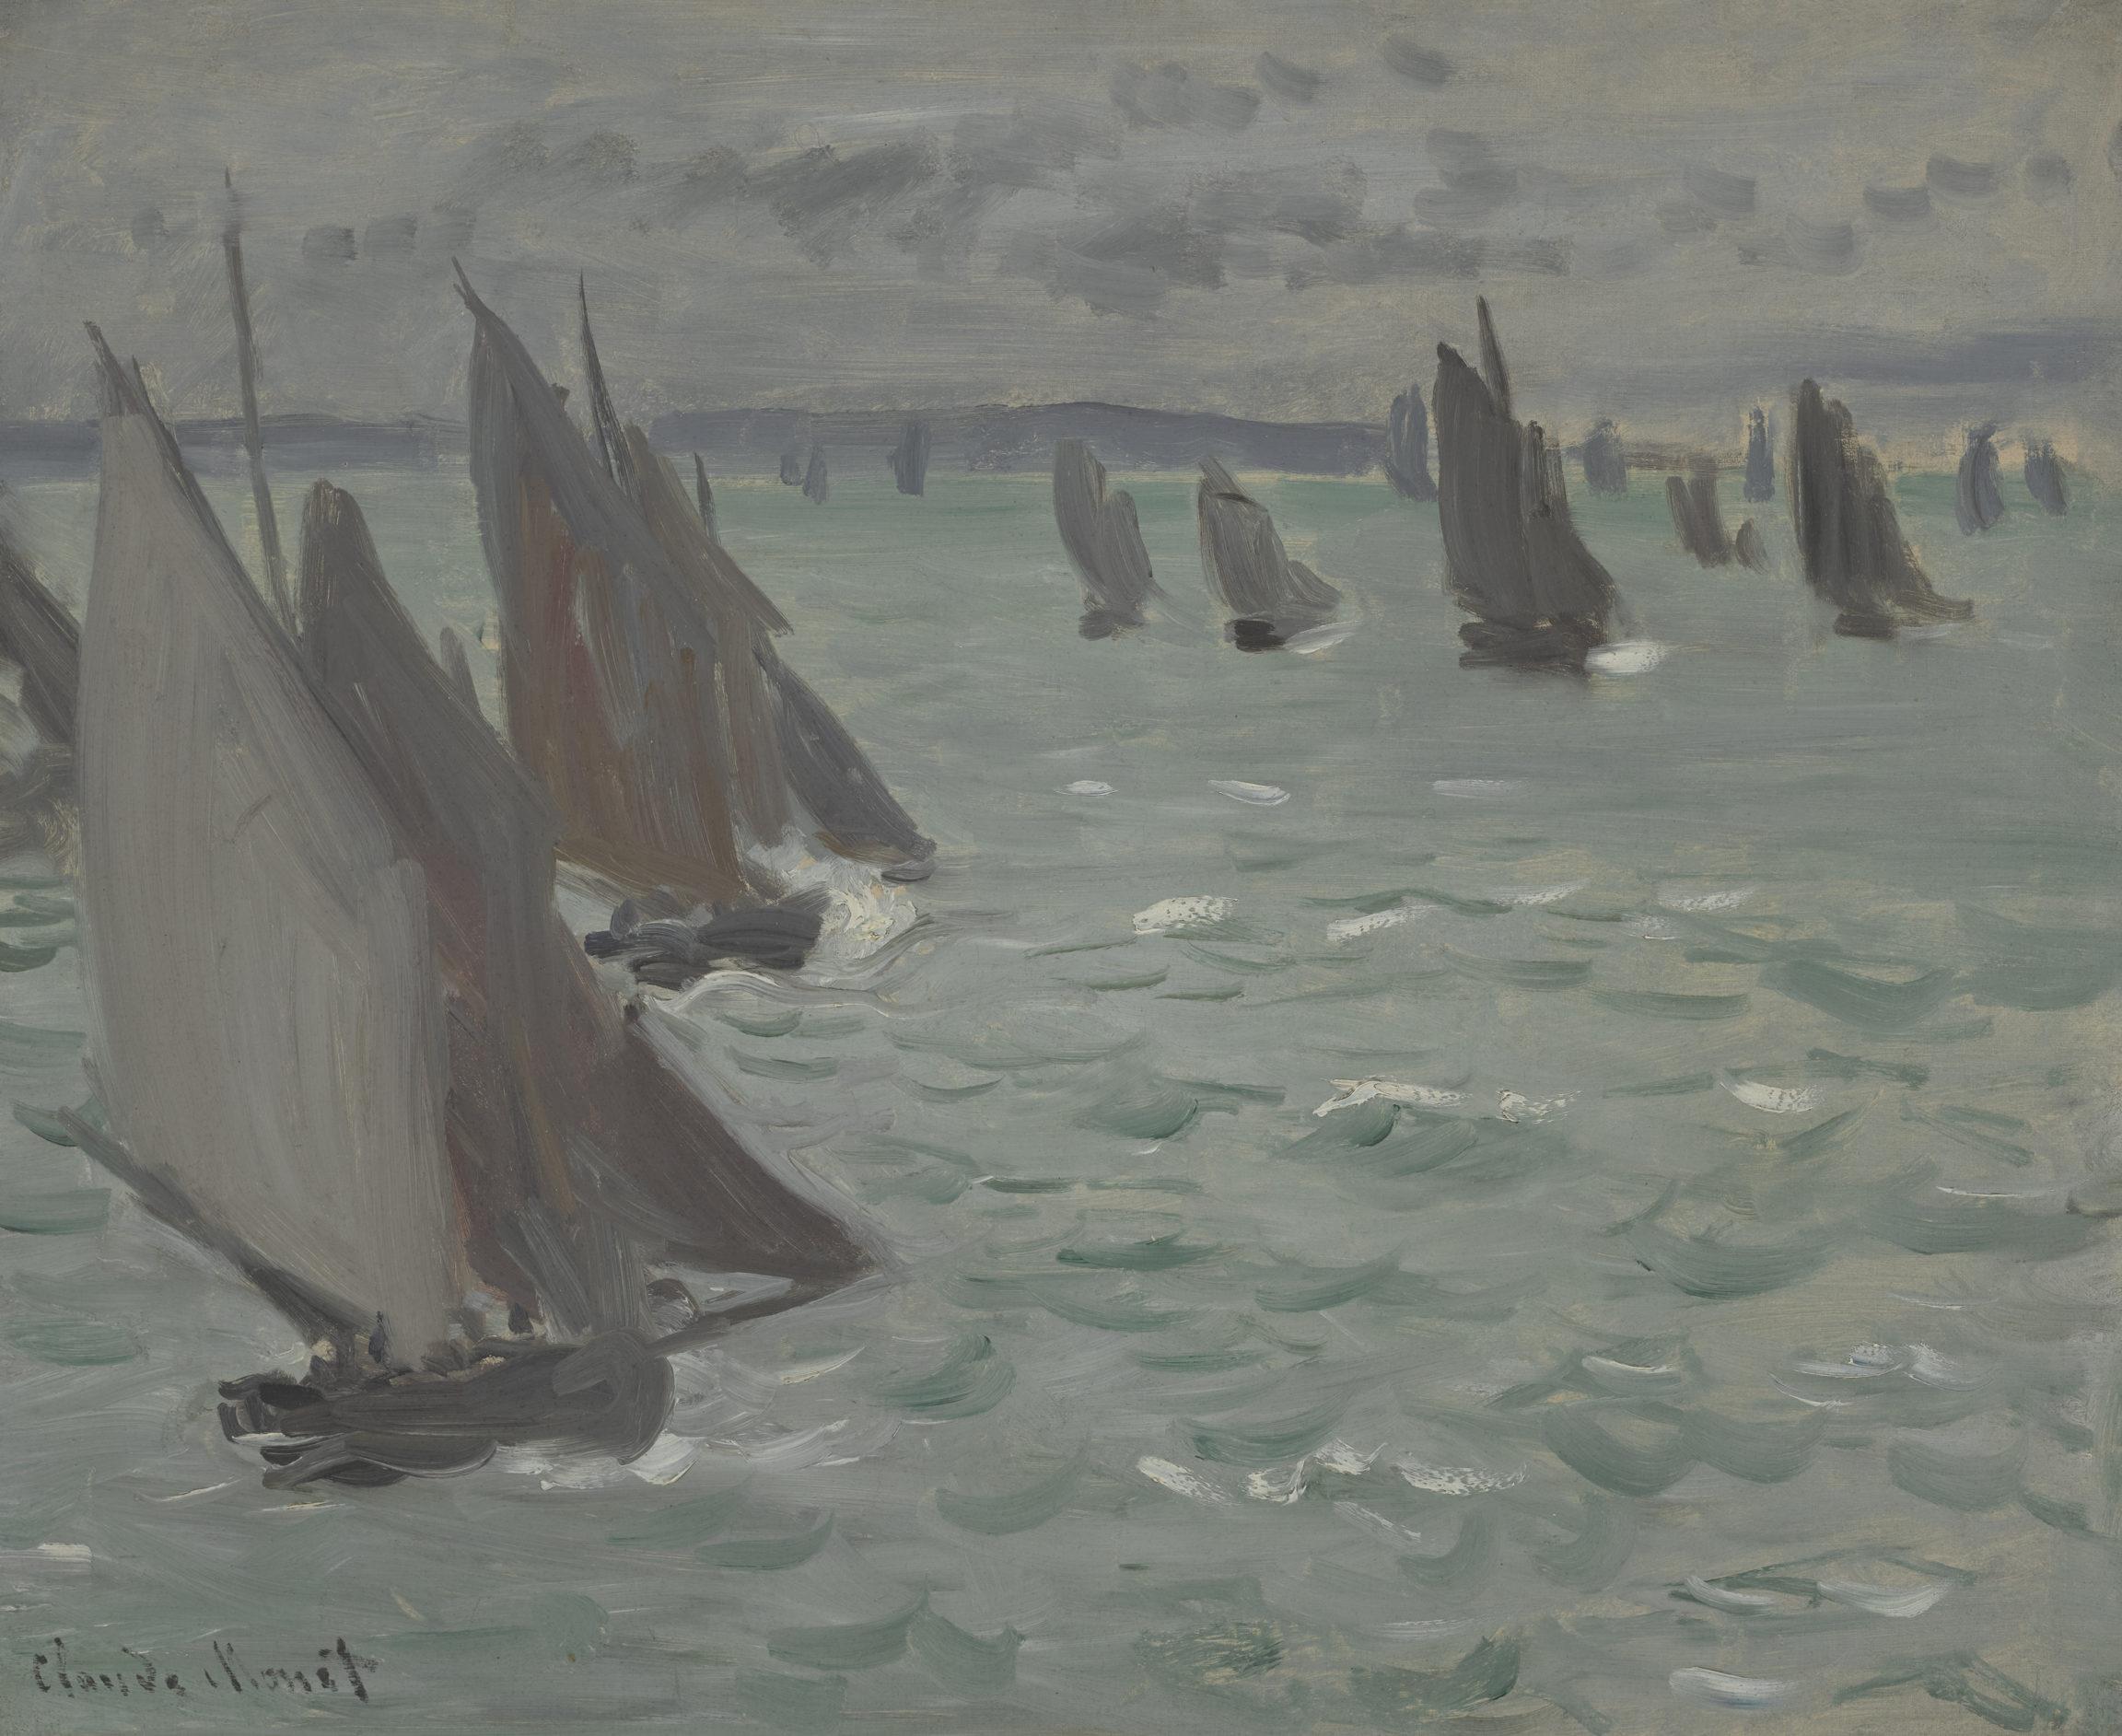 Claude Monet, Voiliers en mer (Sailing Boats at Sea), 1868